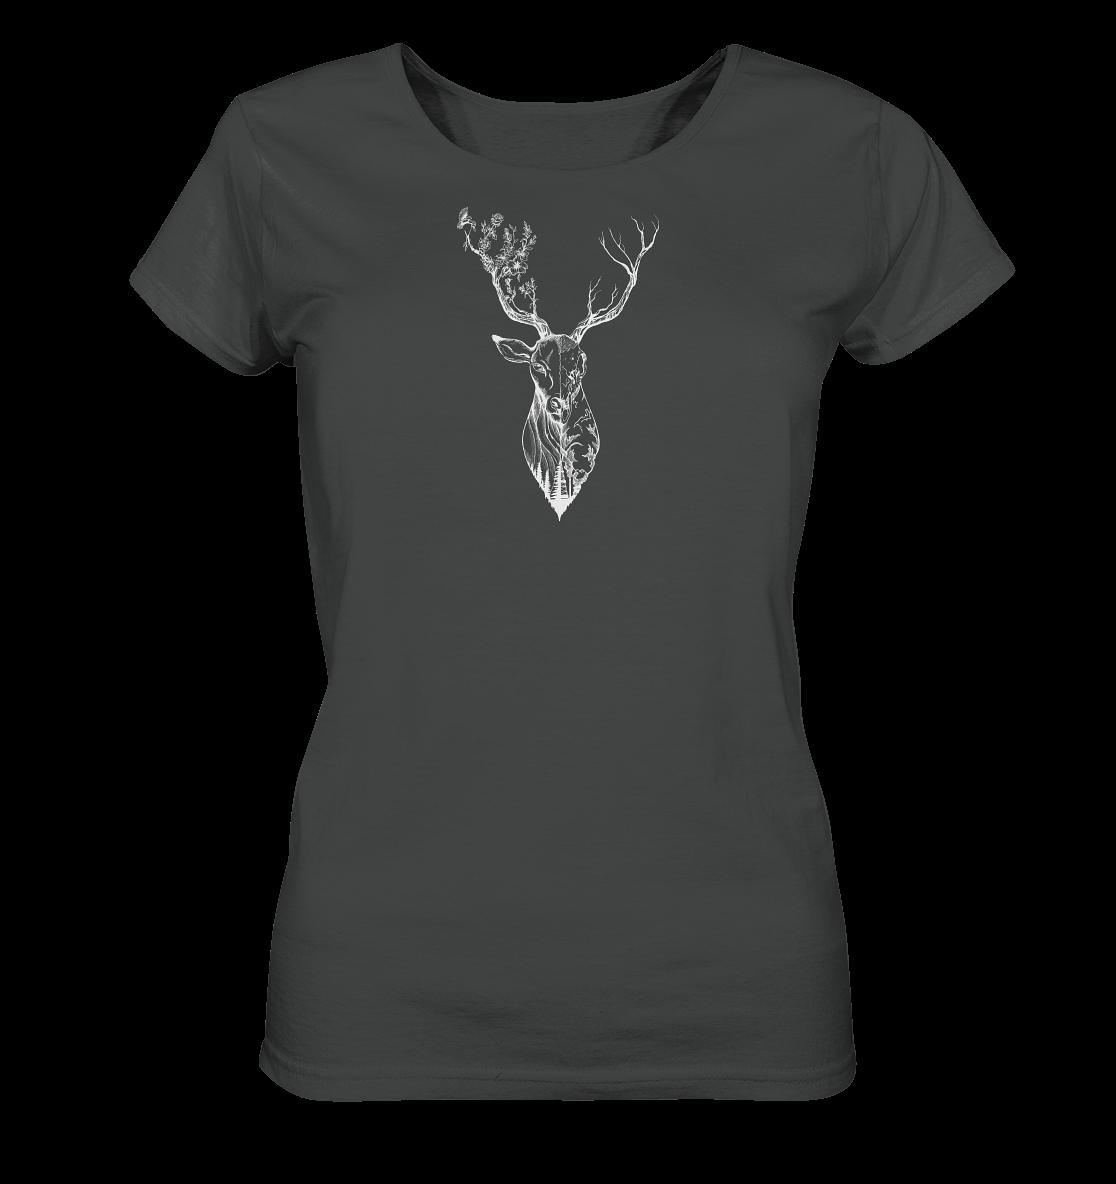 front-ladies-organic-shirt-444545-1116x-7.png